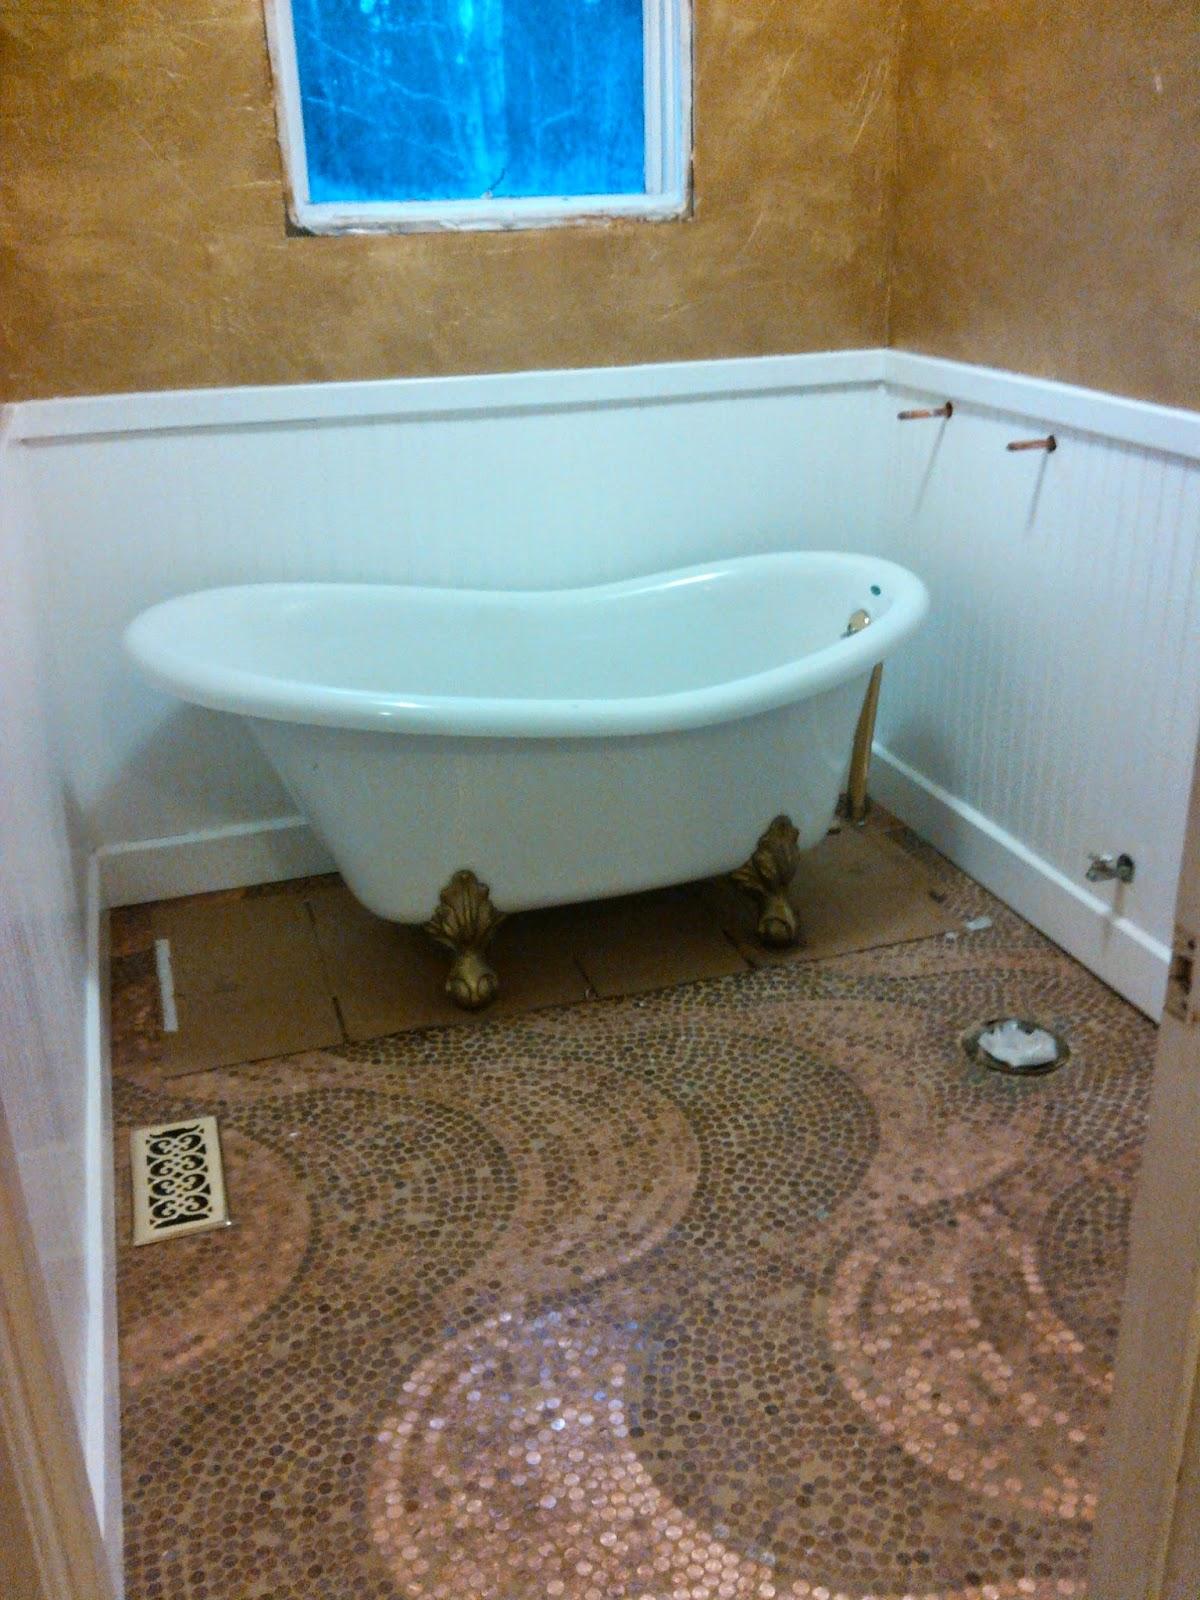 Outstanding Sheetrock Around Tub Festooning - Bathtub Ideas - dilata ...